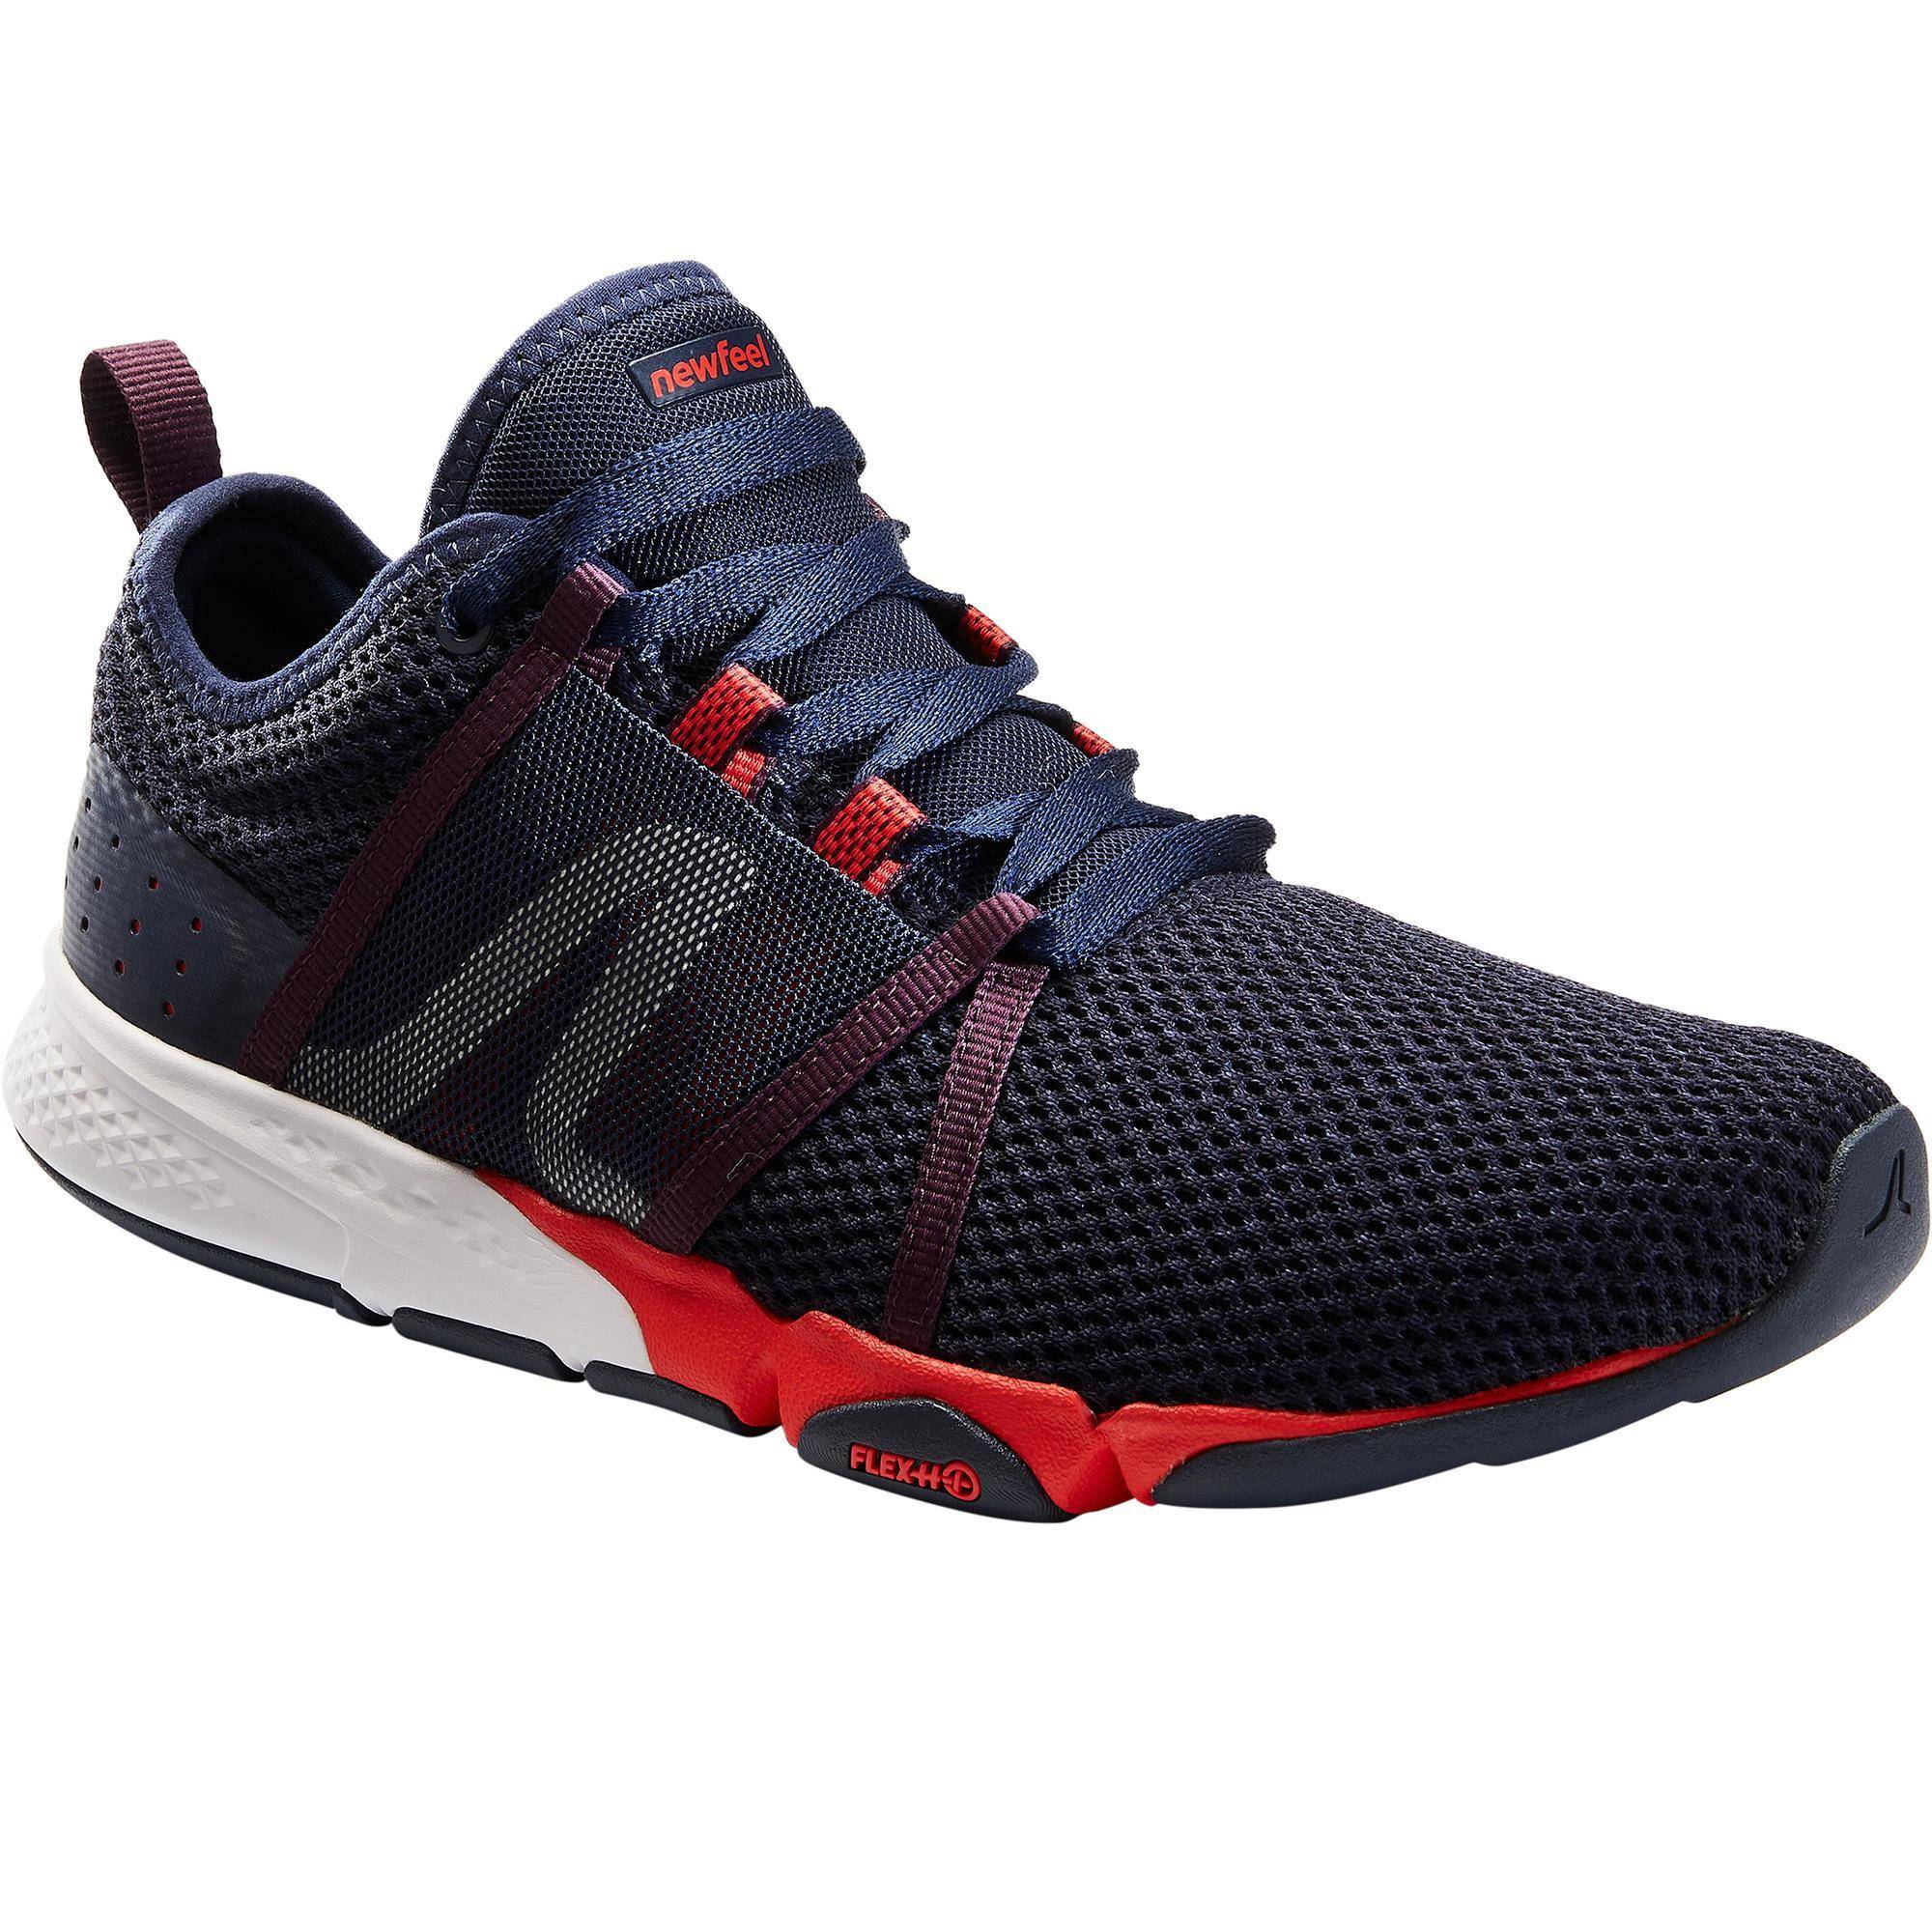 Newfeel Chaussures marche sportive homme PW 540 Flex-H+ bleu / rouge - Newfeel